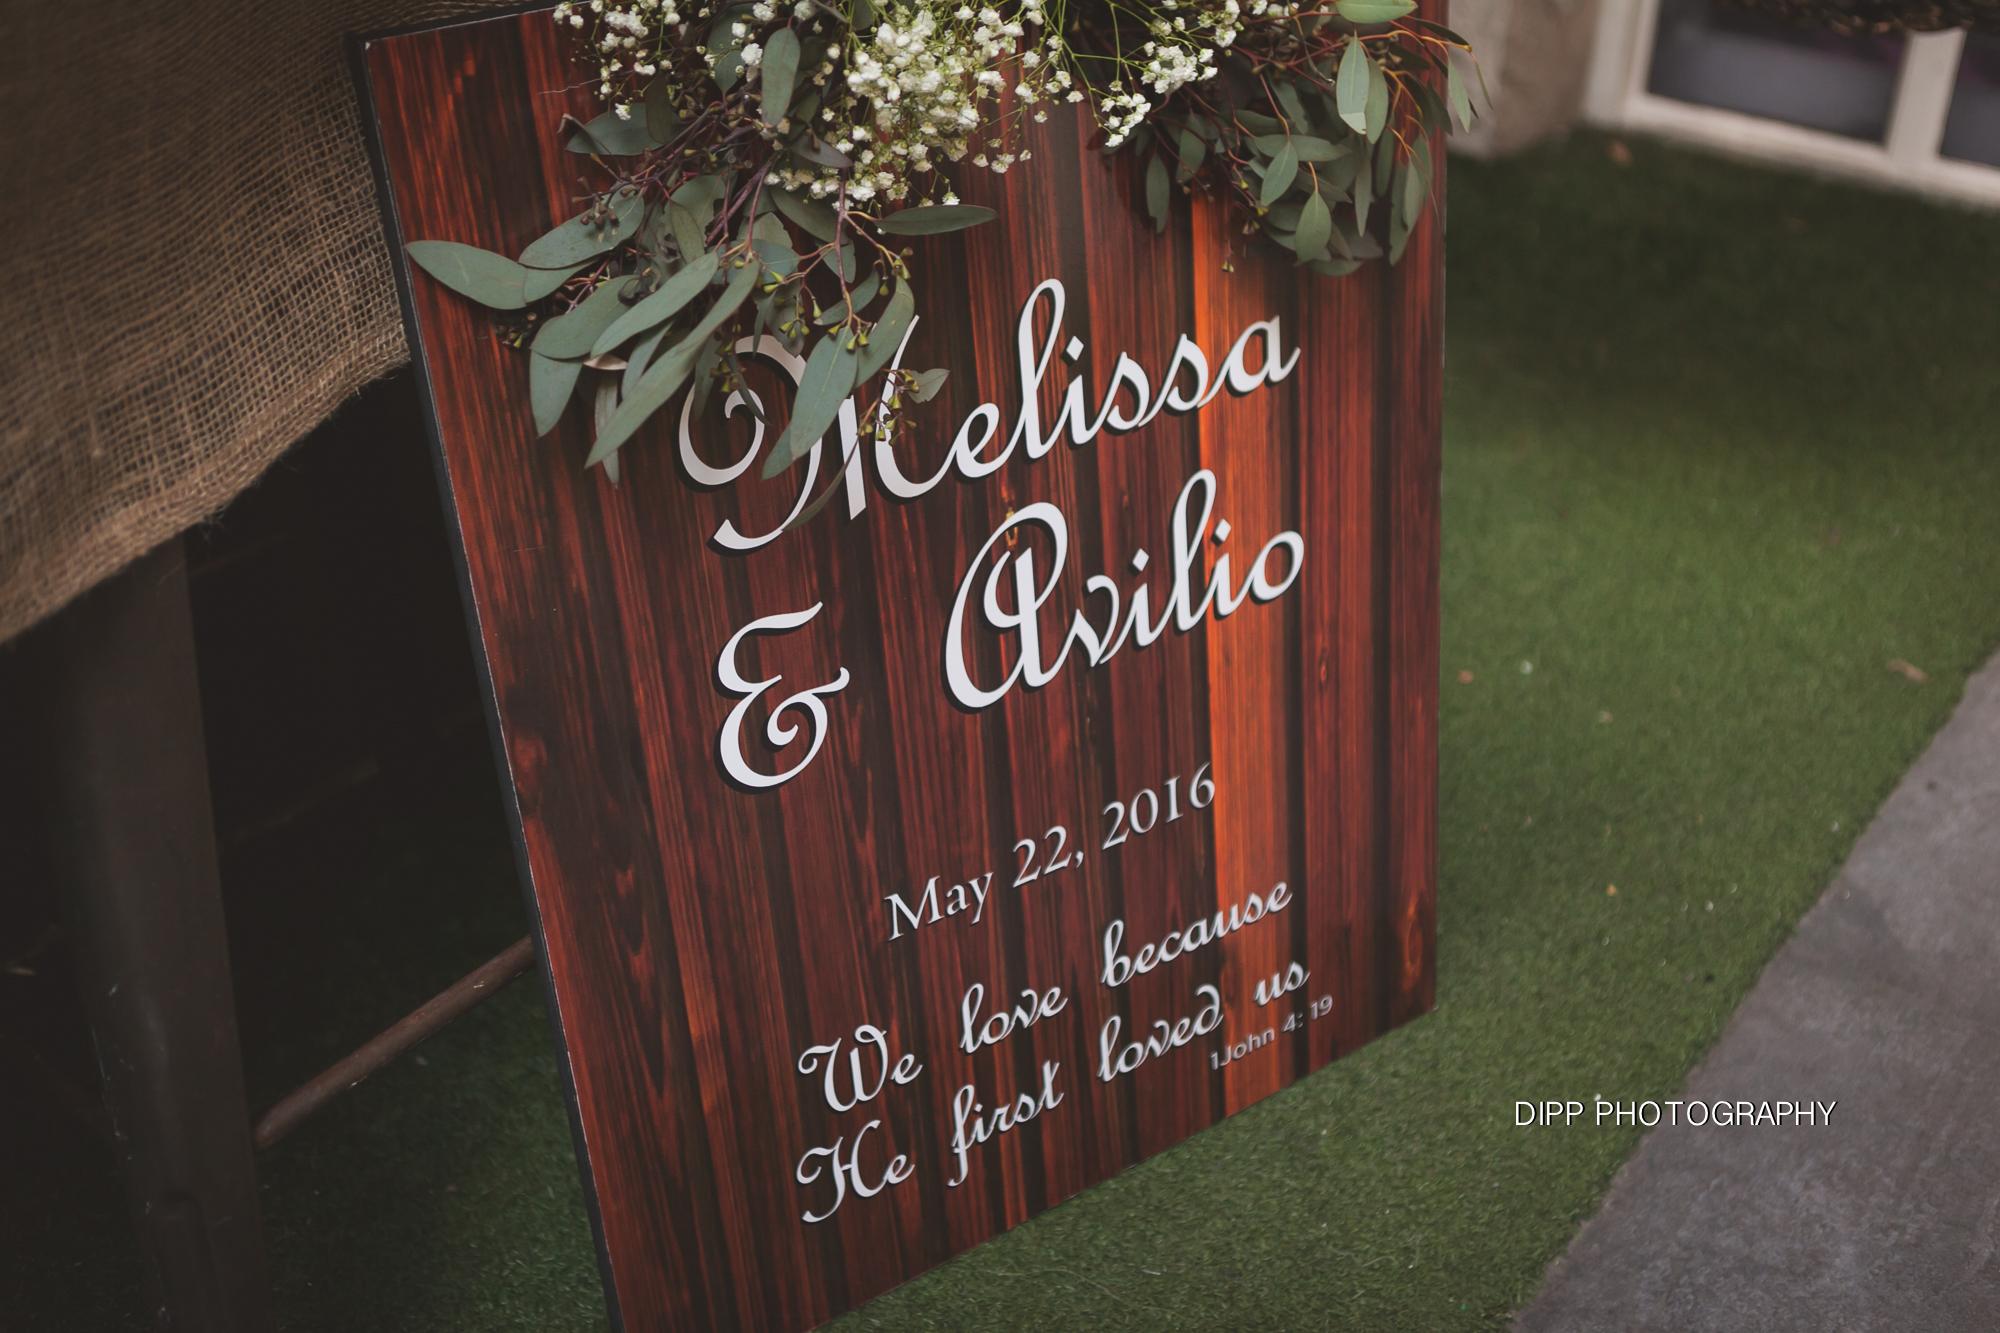 Dipp_2016 EDITED Melissa & Avilio Wedding-372